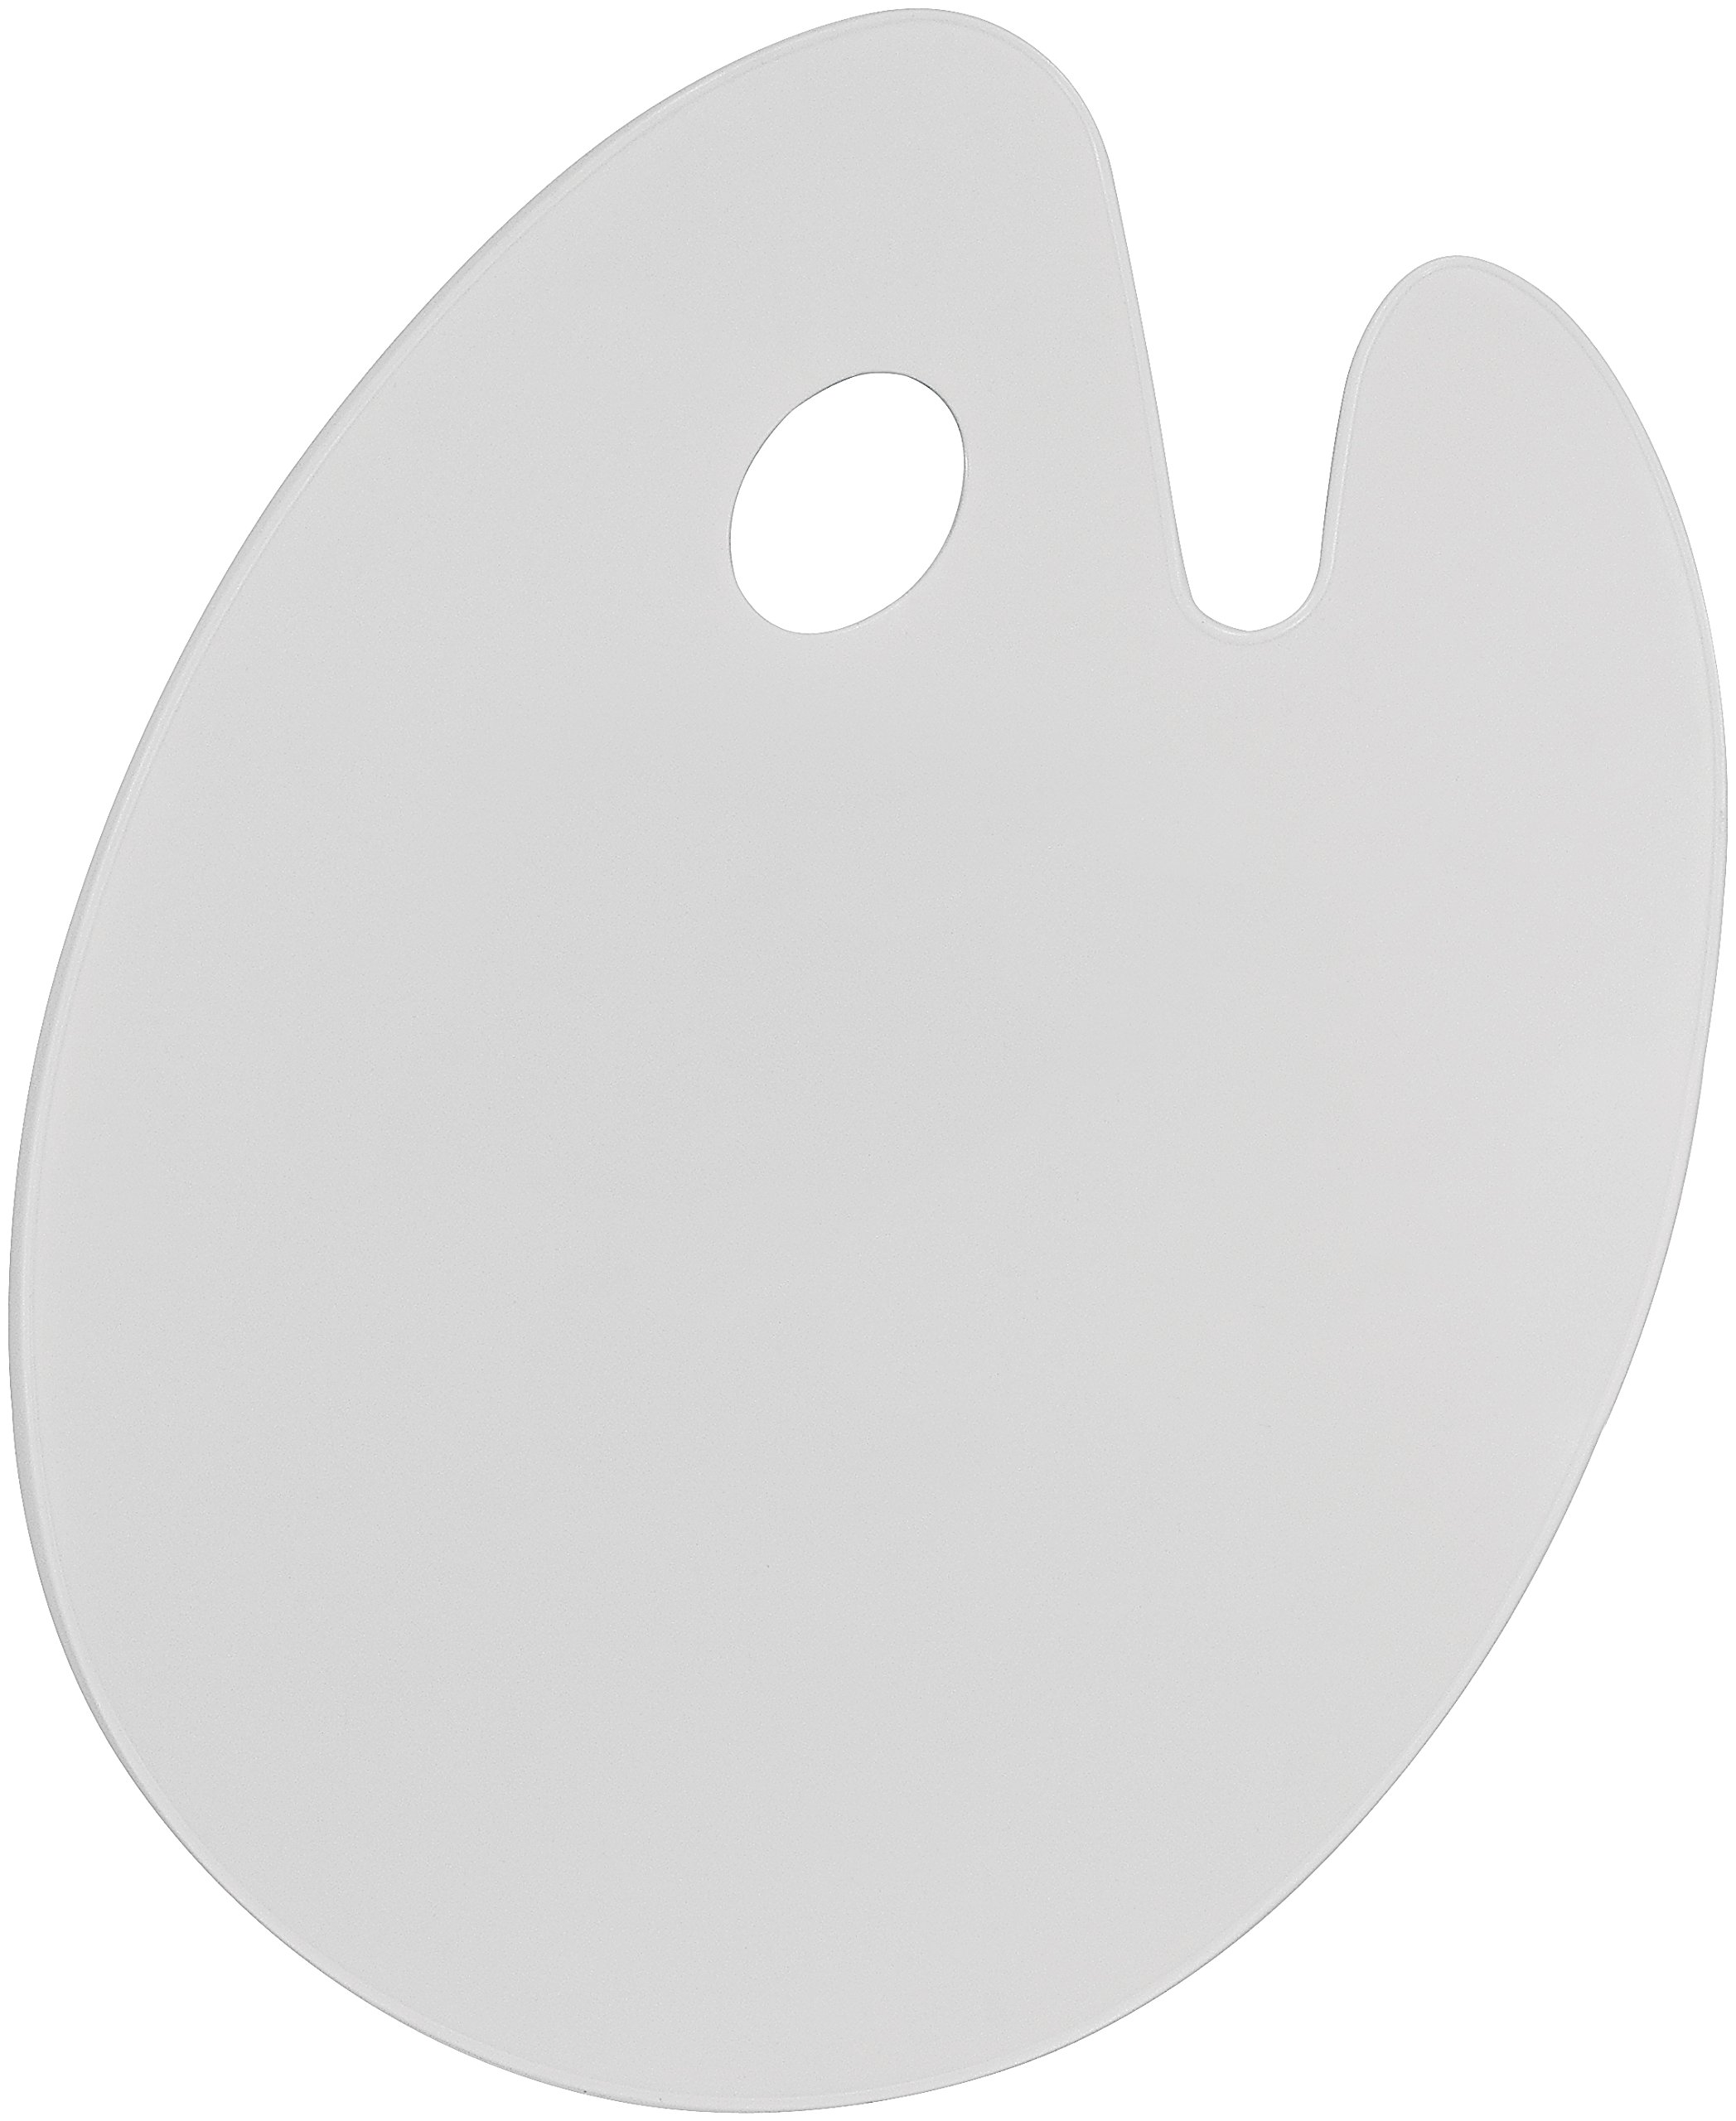 Art Advantage Non-Stick Plastic Palette, 11 by 15-Inch, White by Art Advantage